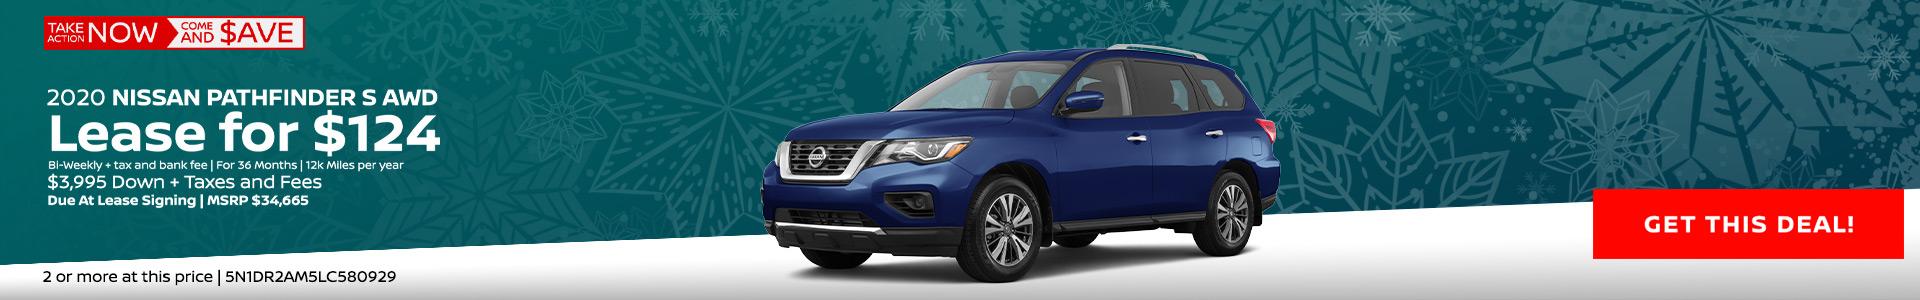 Nissan Pathfinder $124 Lease